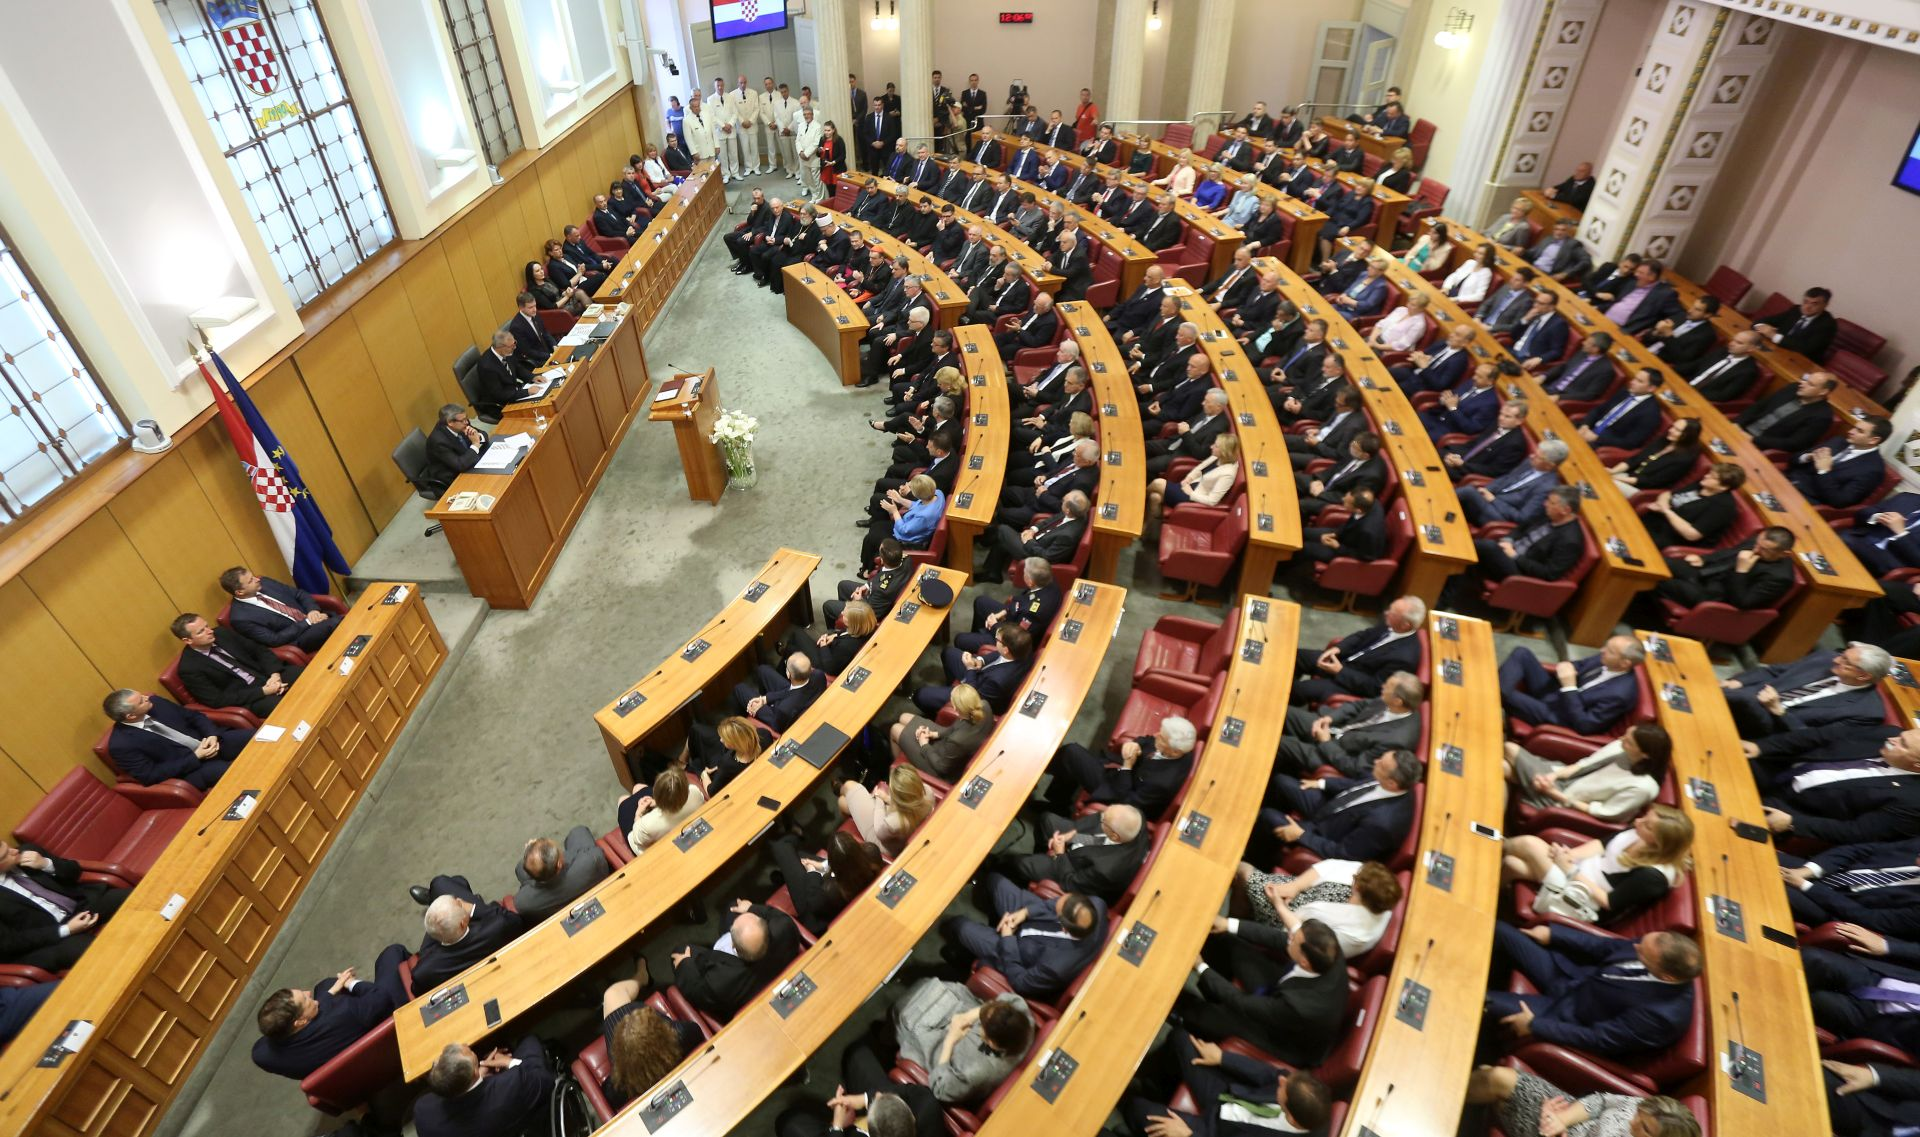 POREZNA REFORMA: Oporba smatra da reforma nema jasan cilj, zastupnici Mosta predložili niz poboljšanja